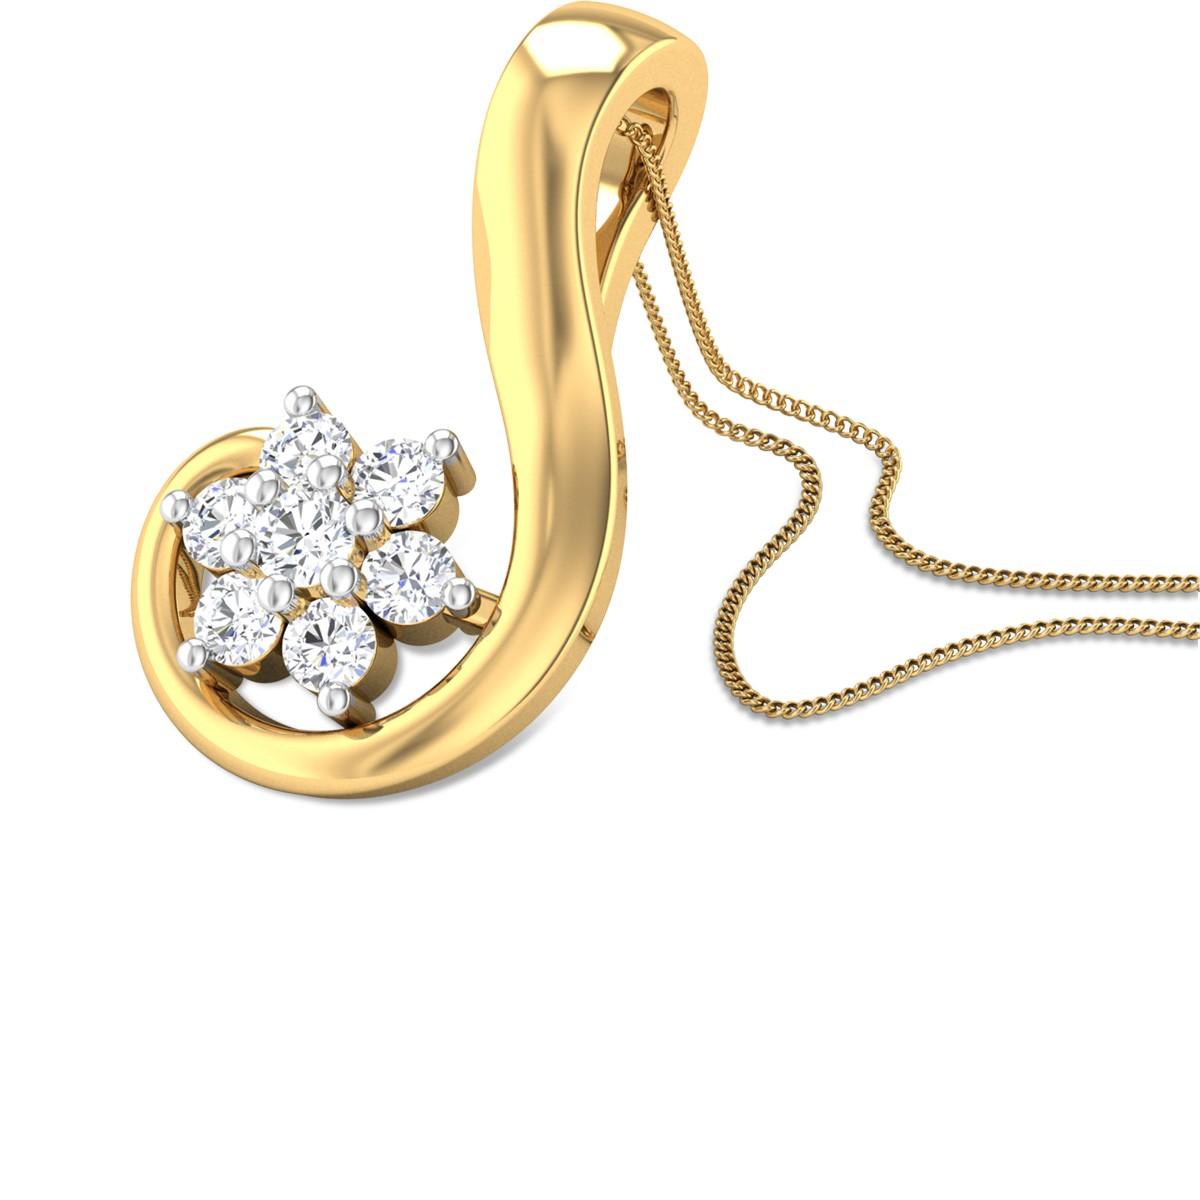 Auricula Diamond Pendant